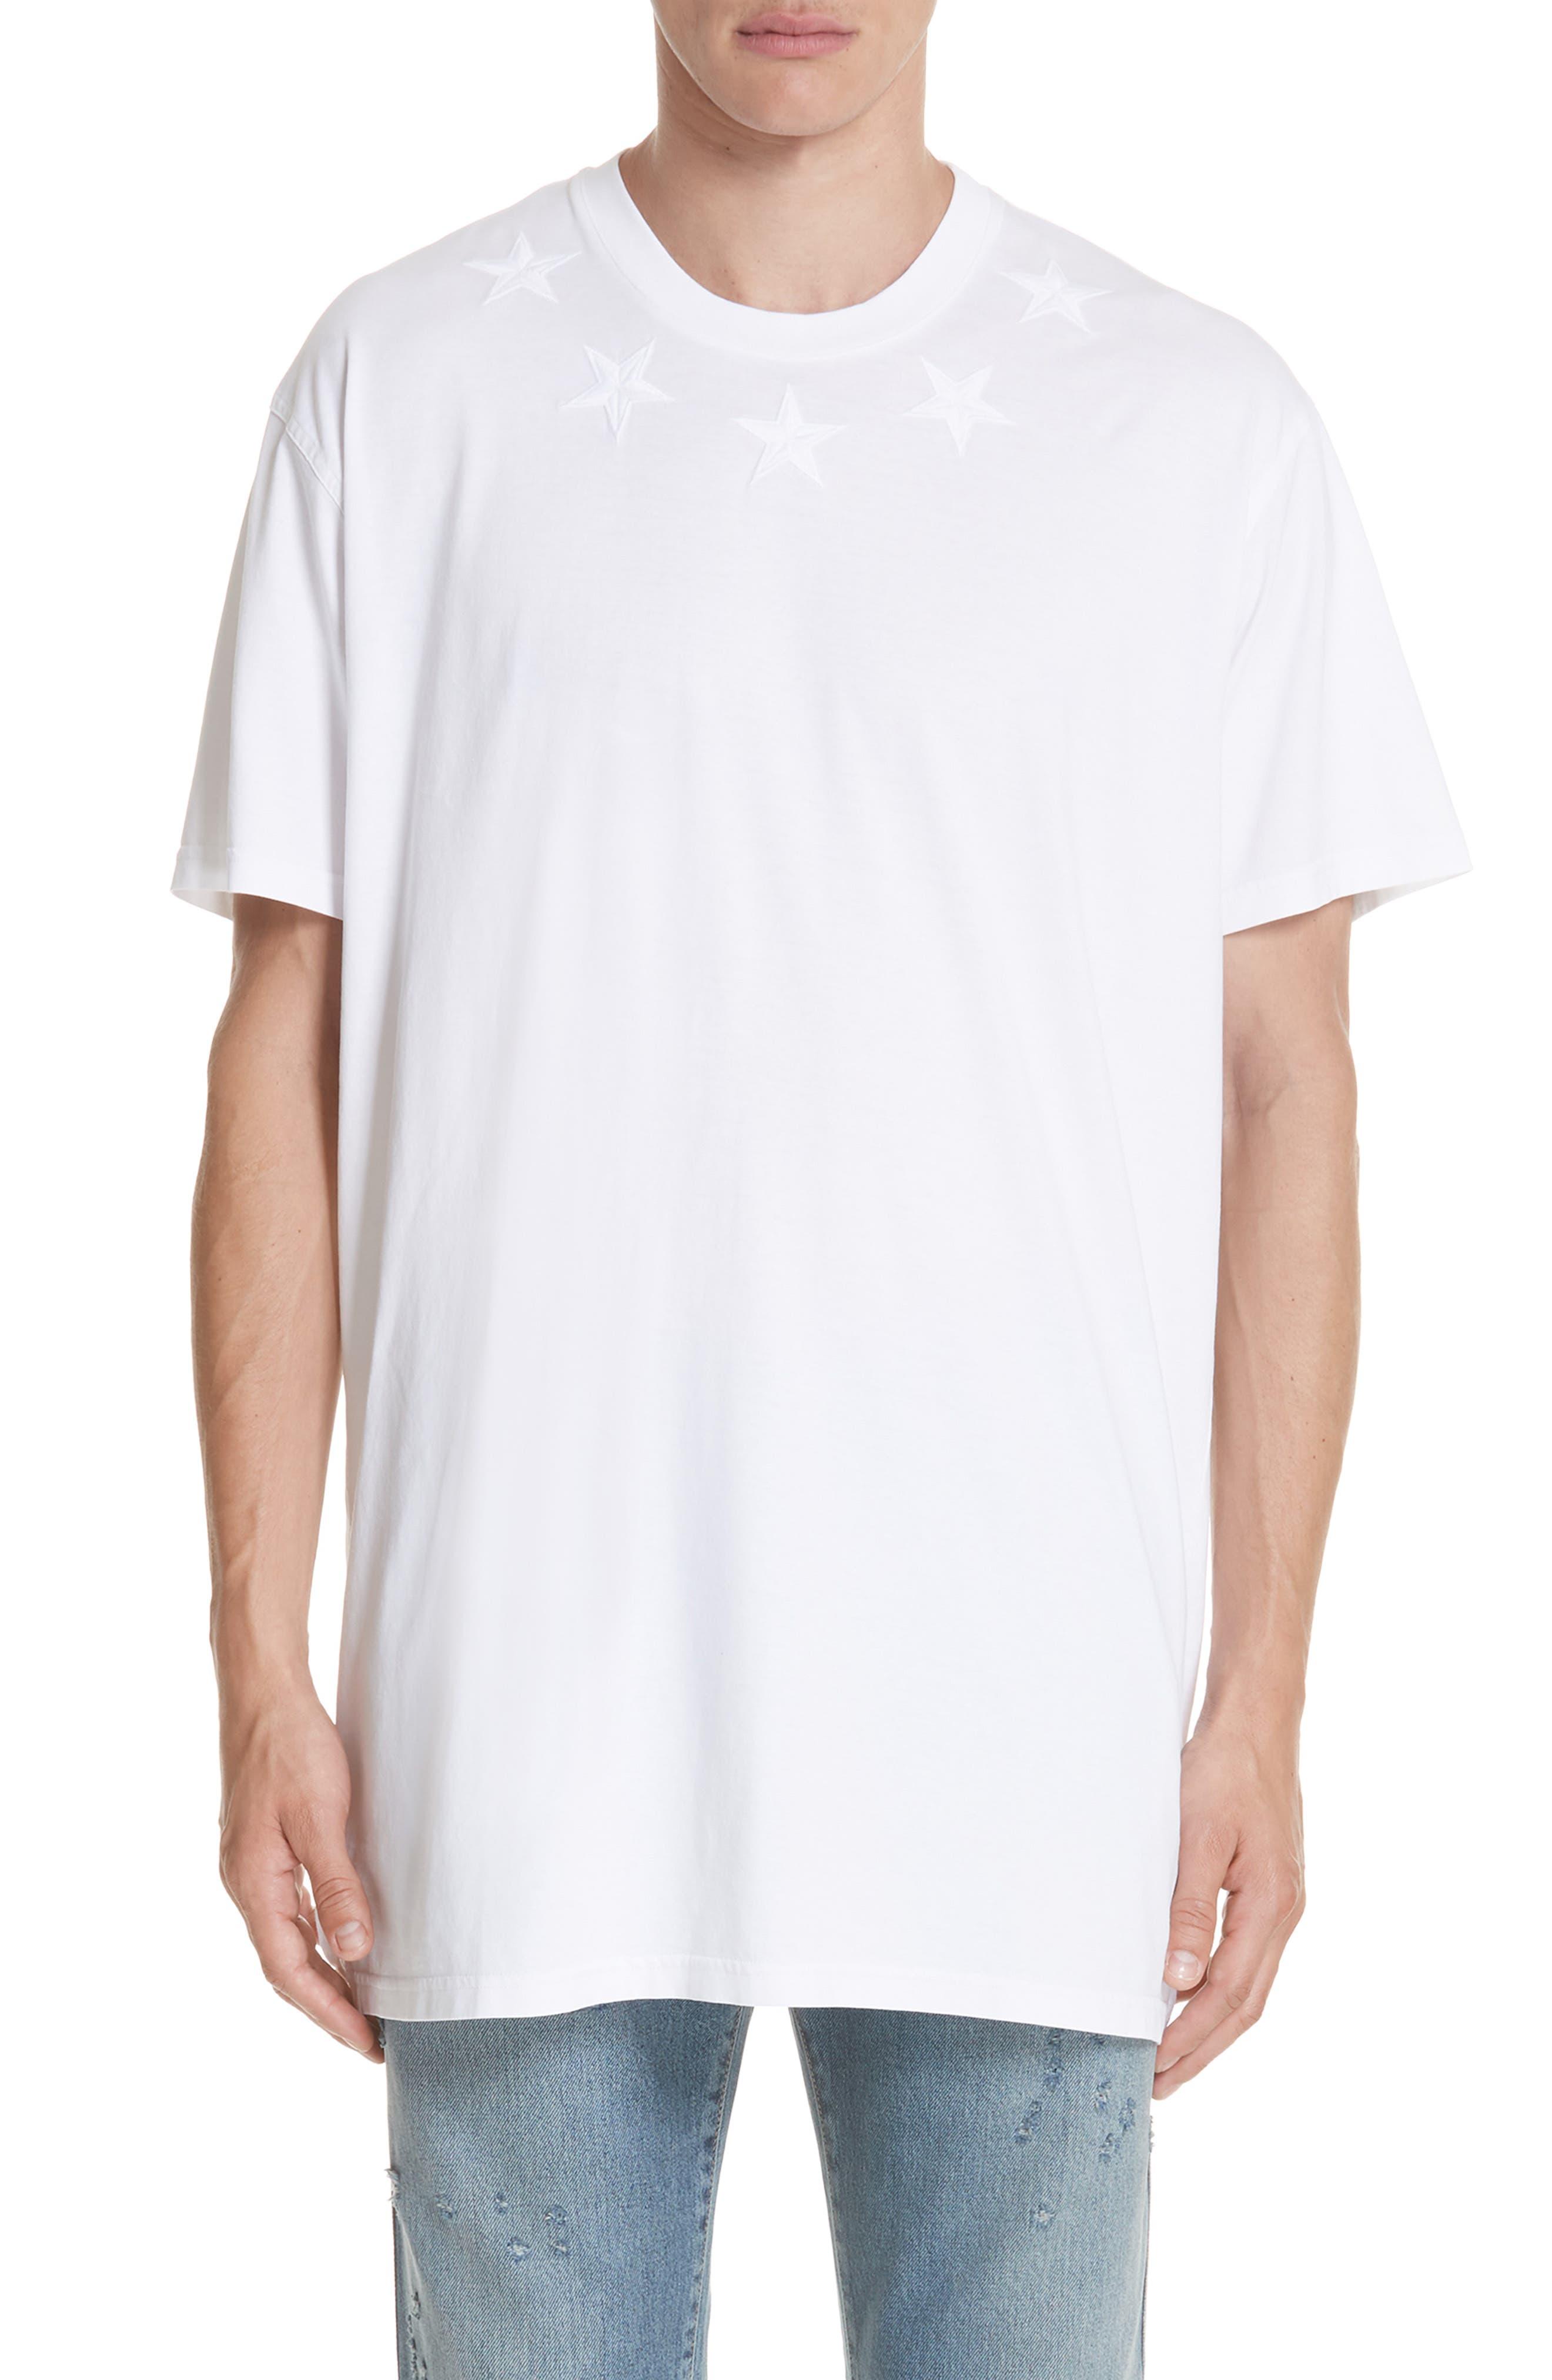 GIVENCHY Star Appliqué T-Shirt, Main, color, WHITE